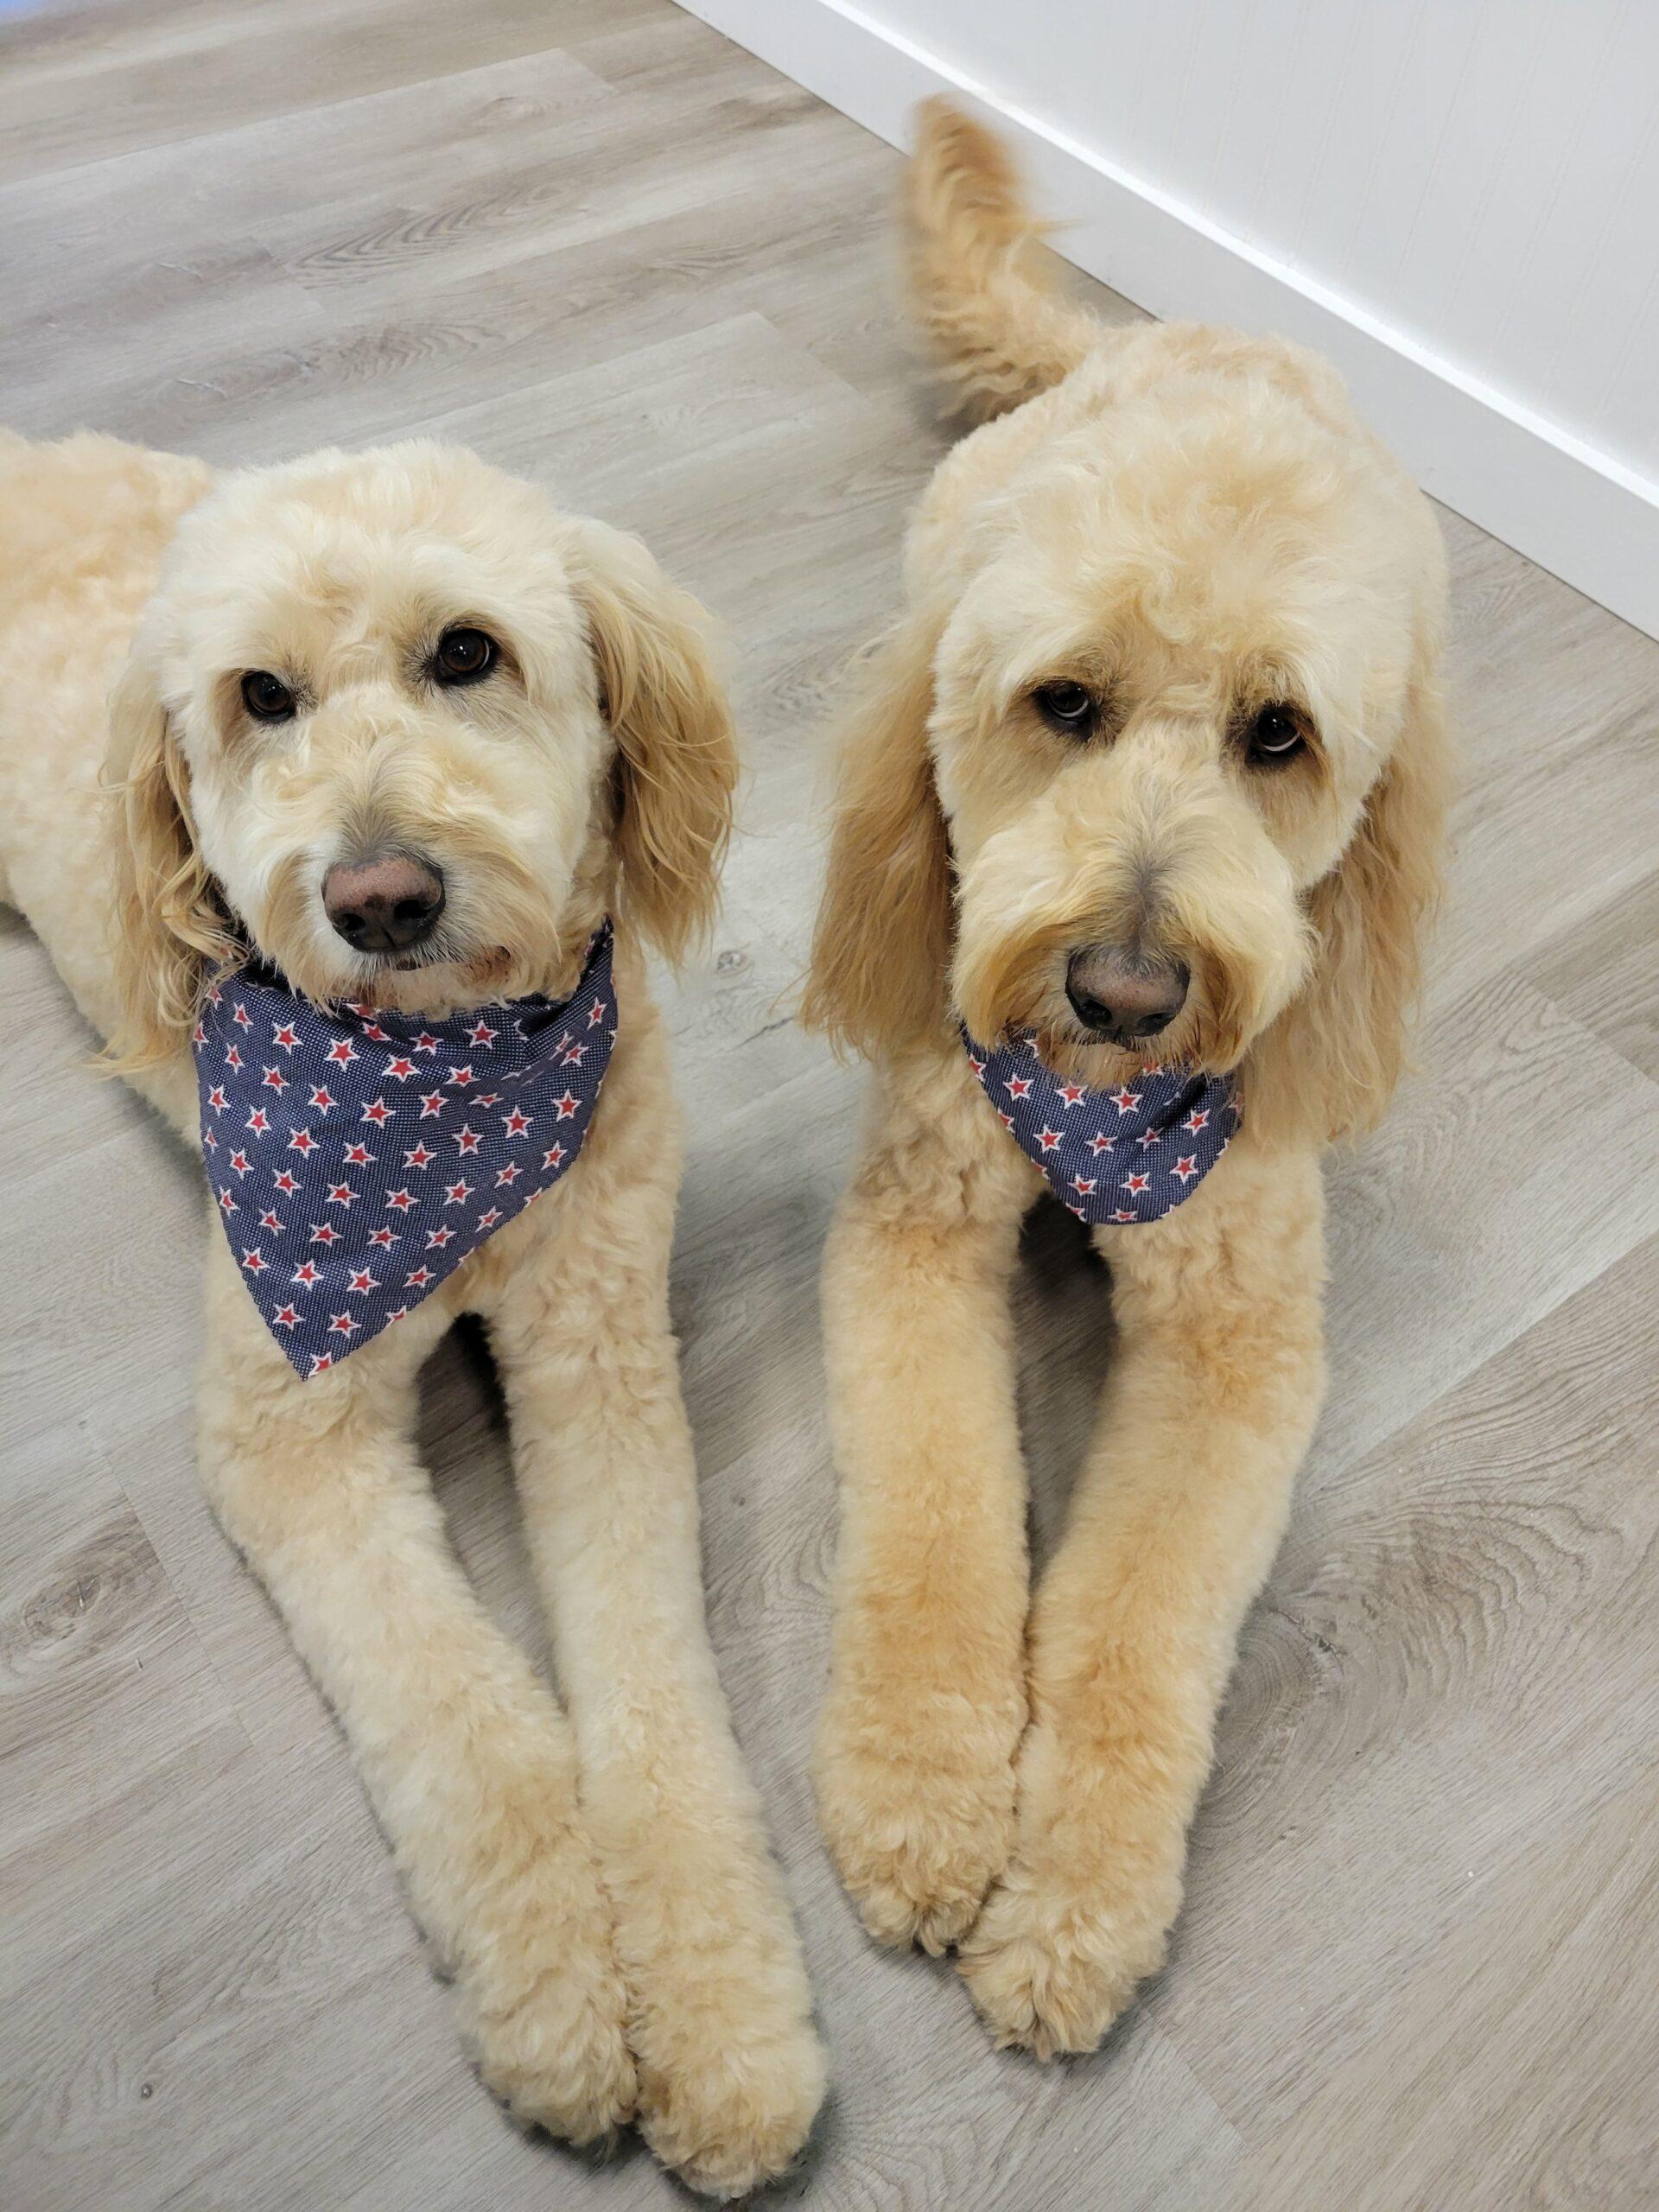 Le Patou Canine Salon